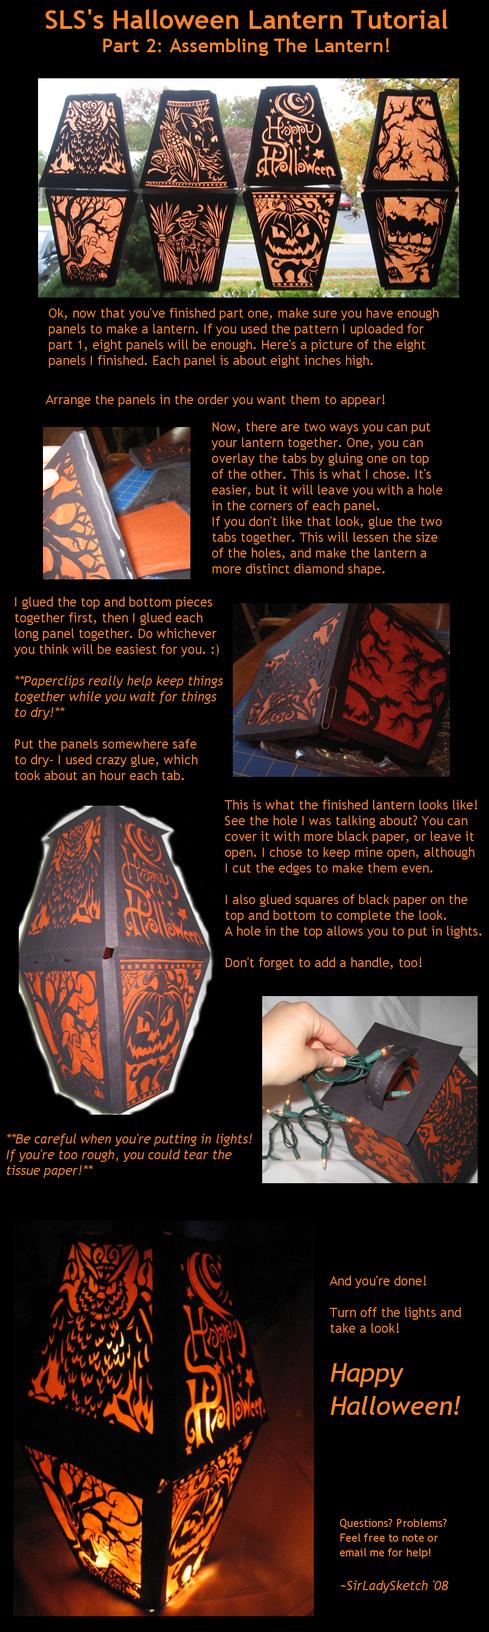 Lantern Tut. Part 2 by SirLadySketch